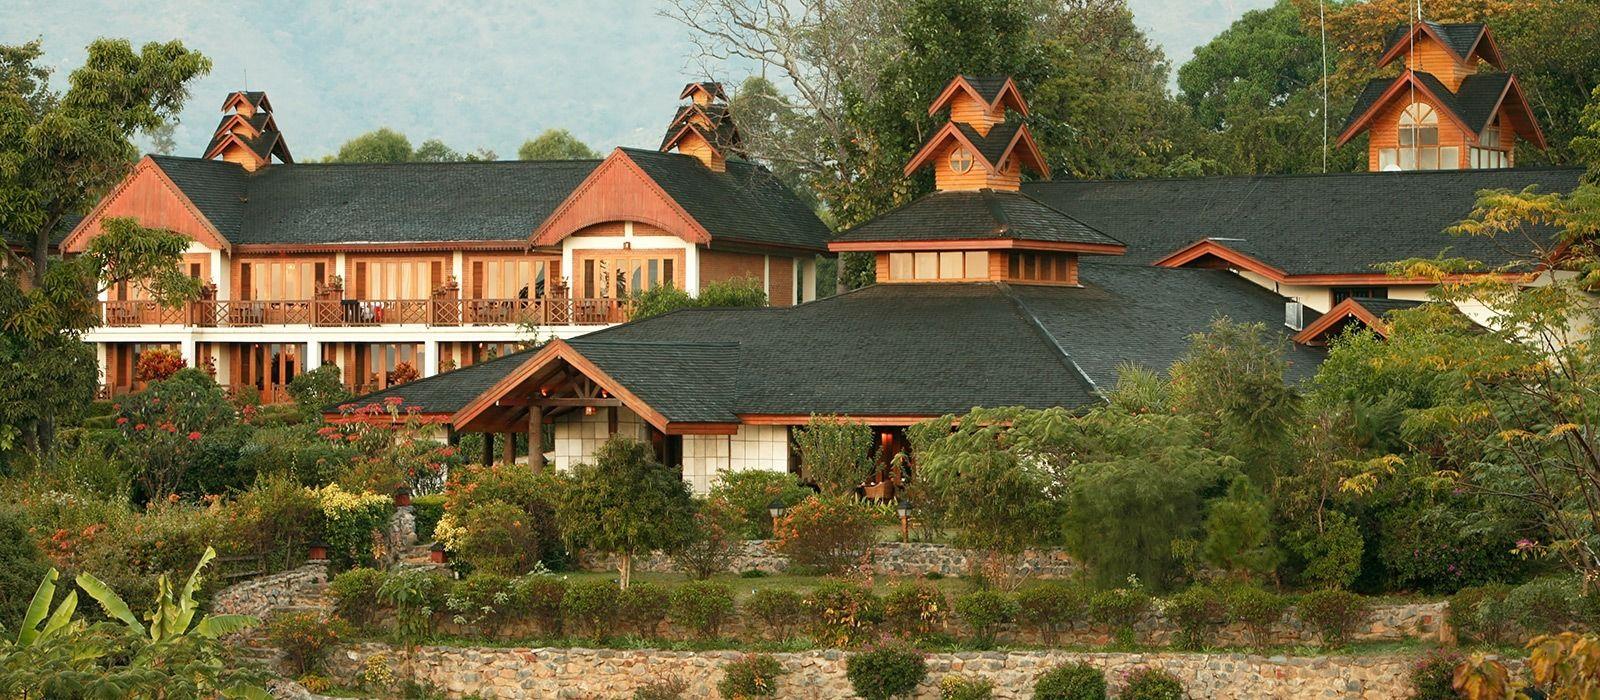 Hotel Inle Lake View Myanmar